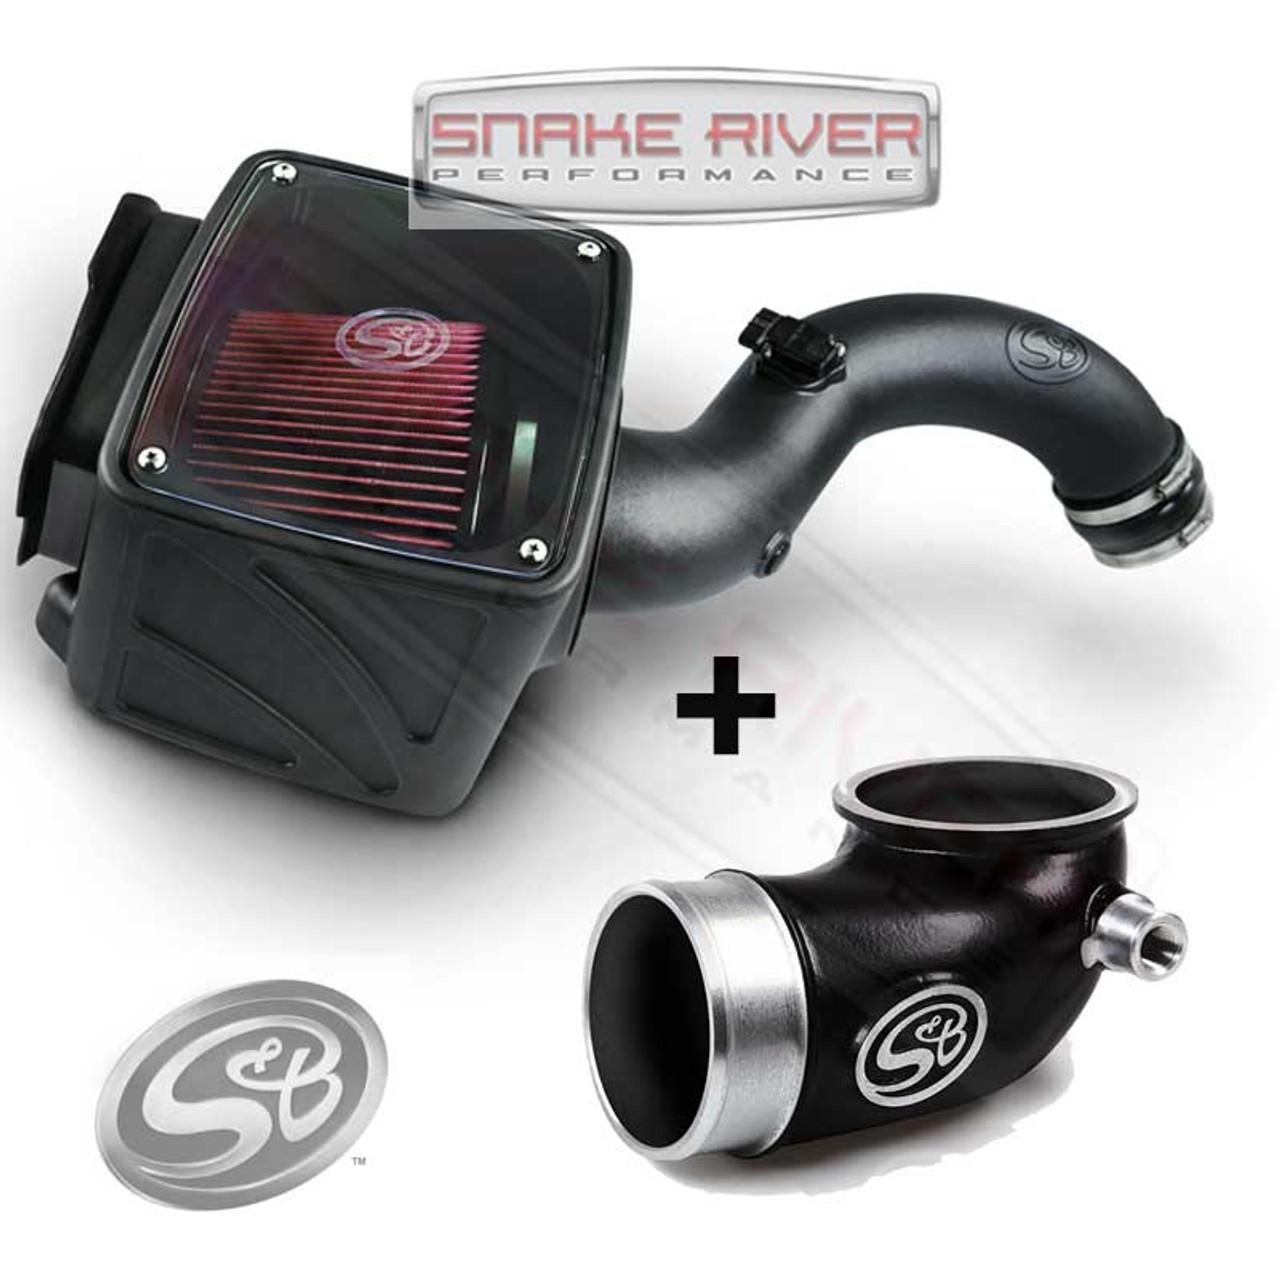 OBX Throttle Body Spacer Fits 01 02 03 04 Silverado Sierra 2500 HD 6.6L Duramax